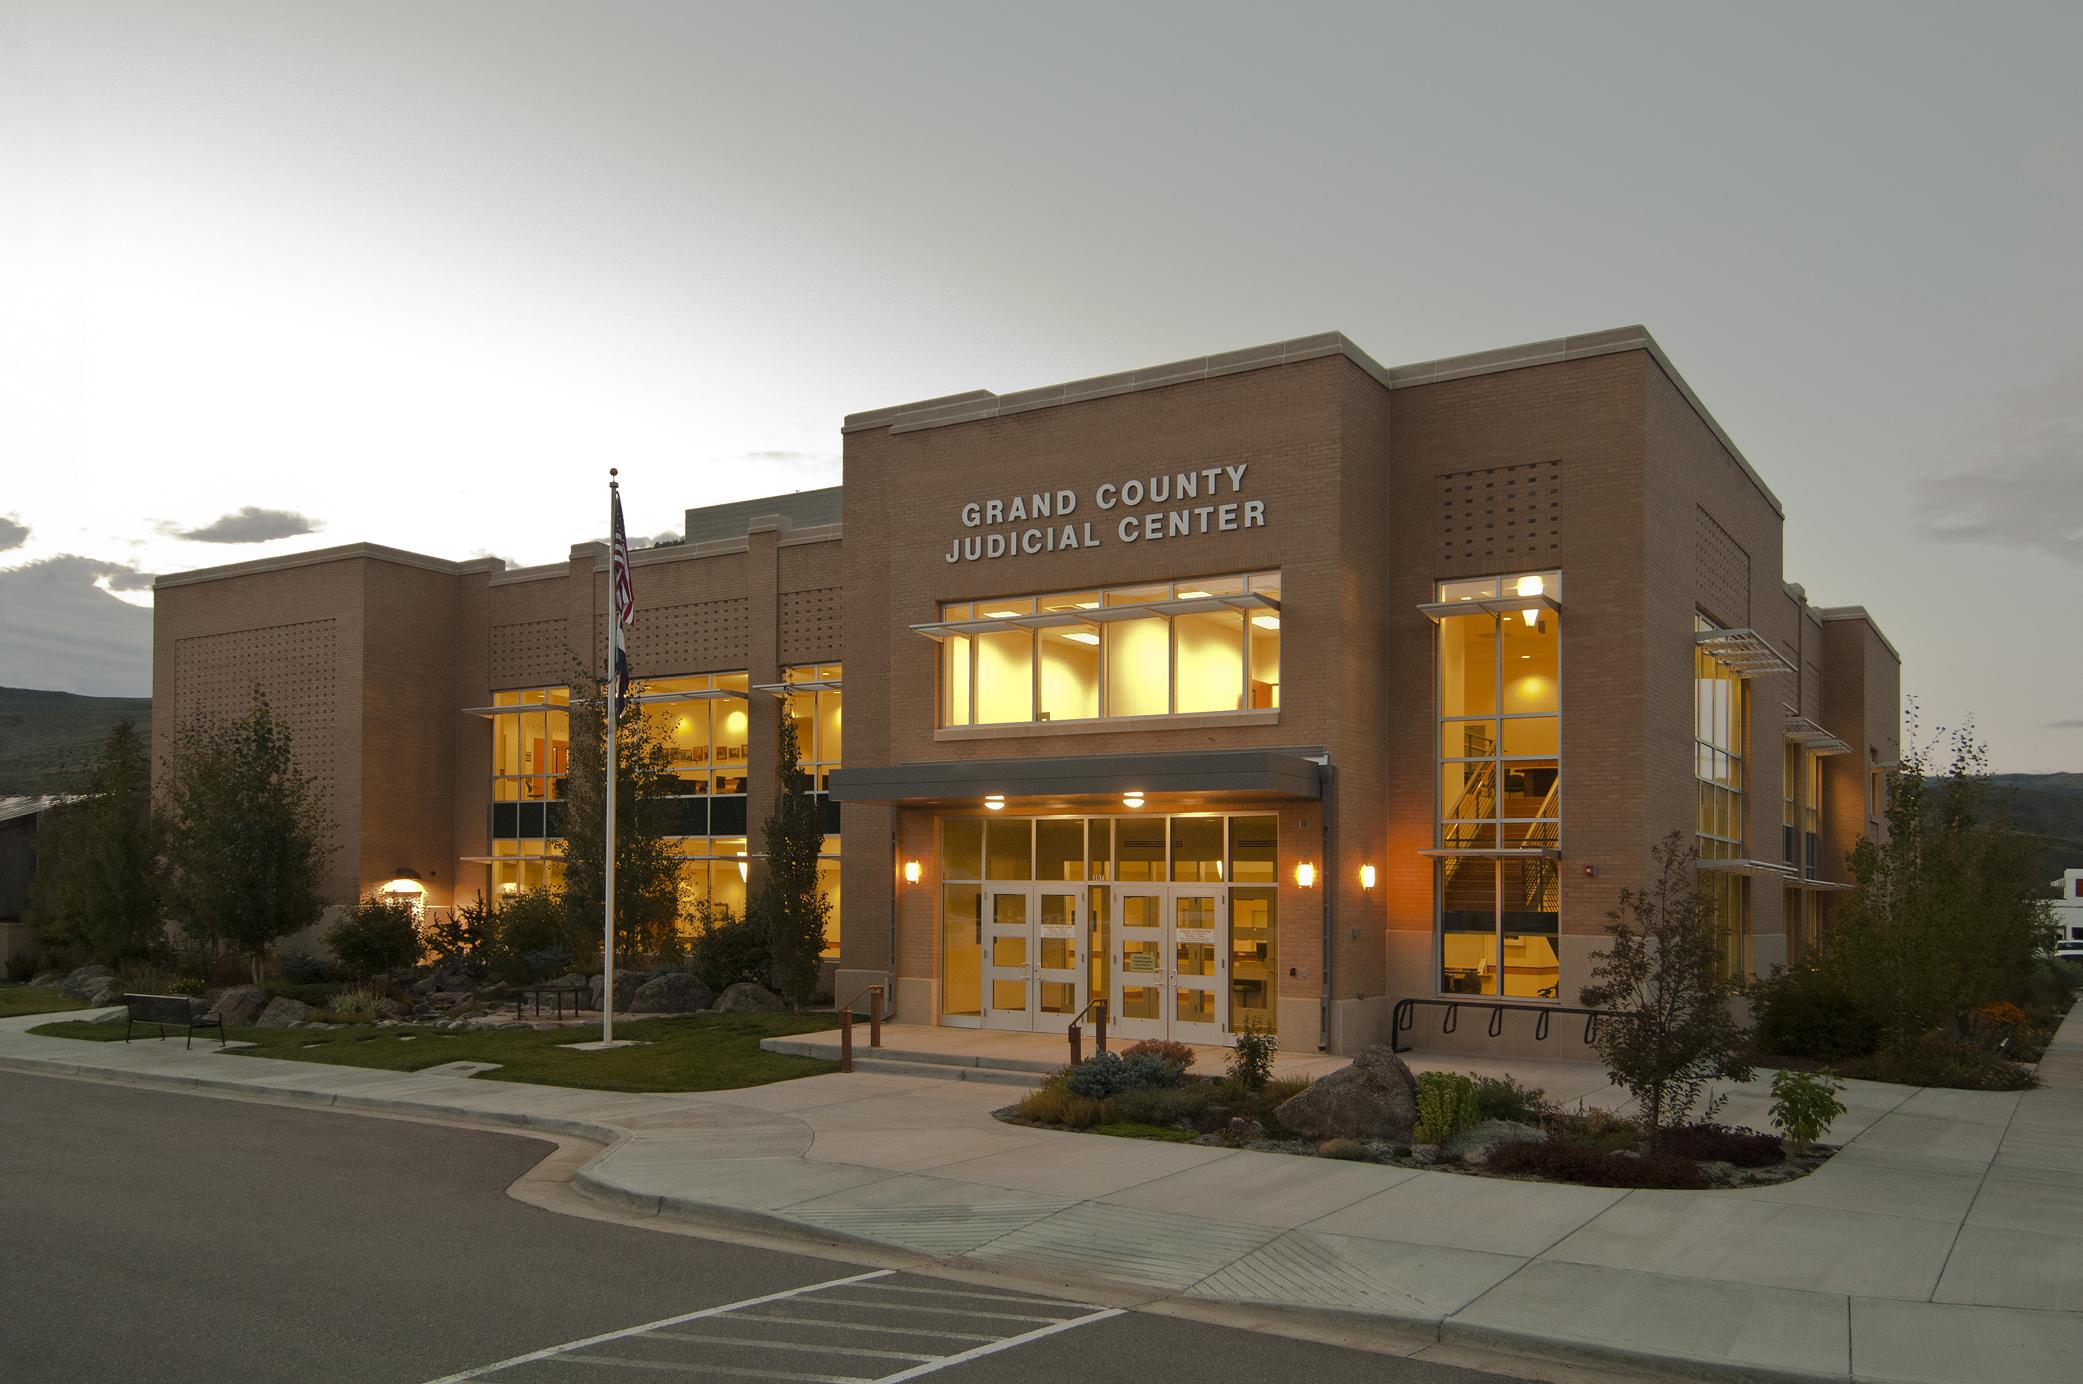 Grand-County-Judicial-Ctr_290_8x300